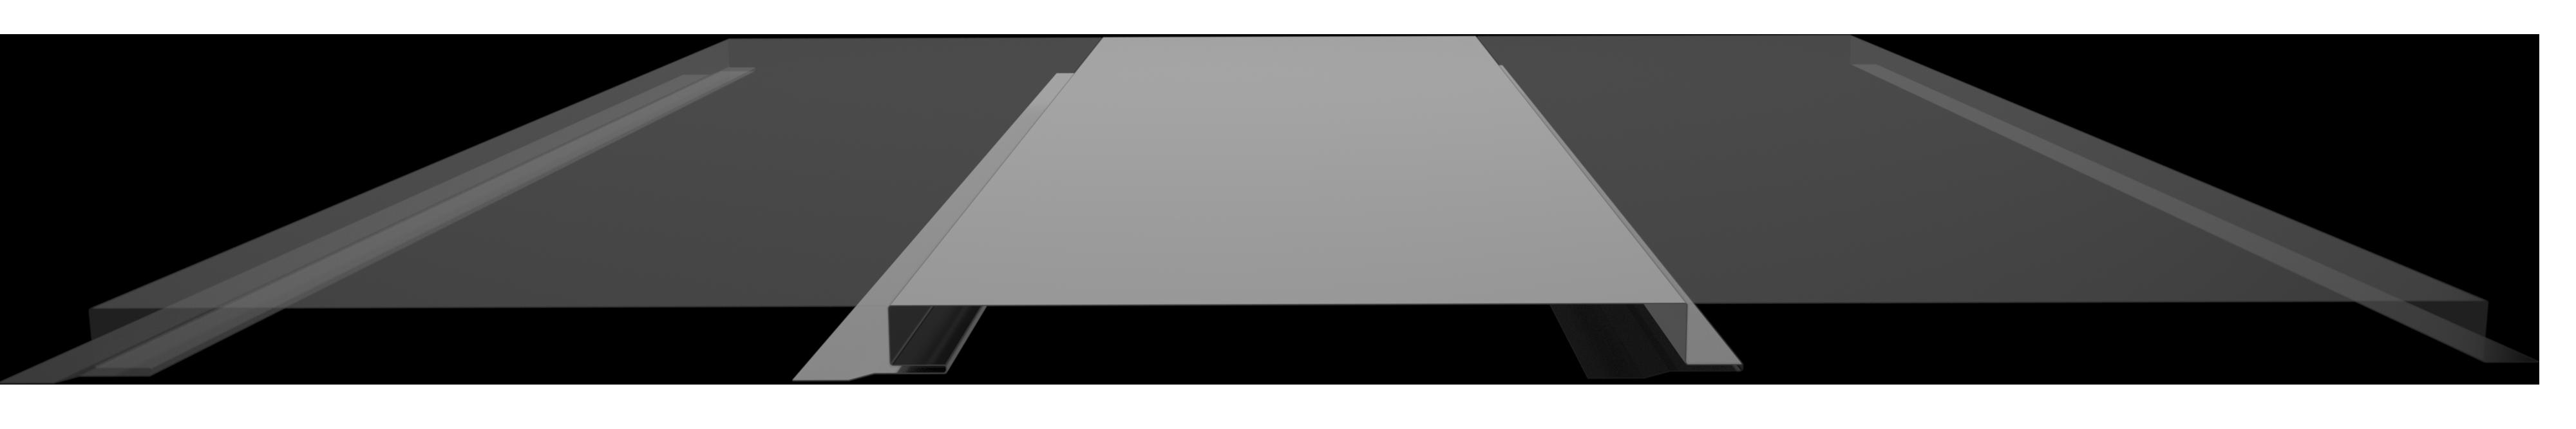 Flush Soffit Panel Showcase